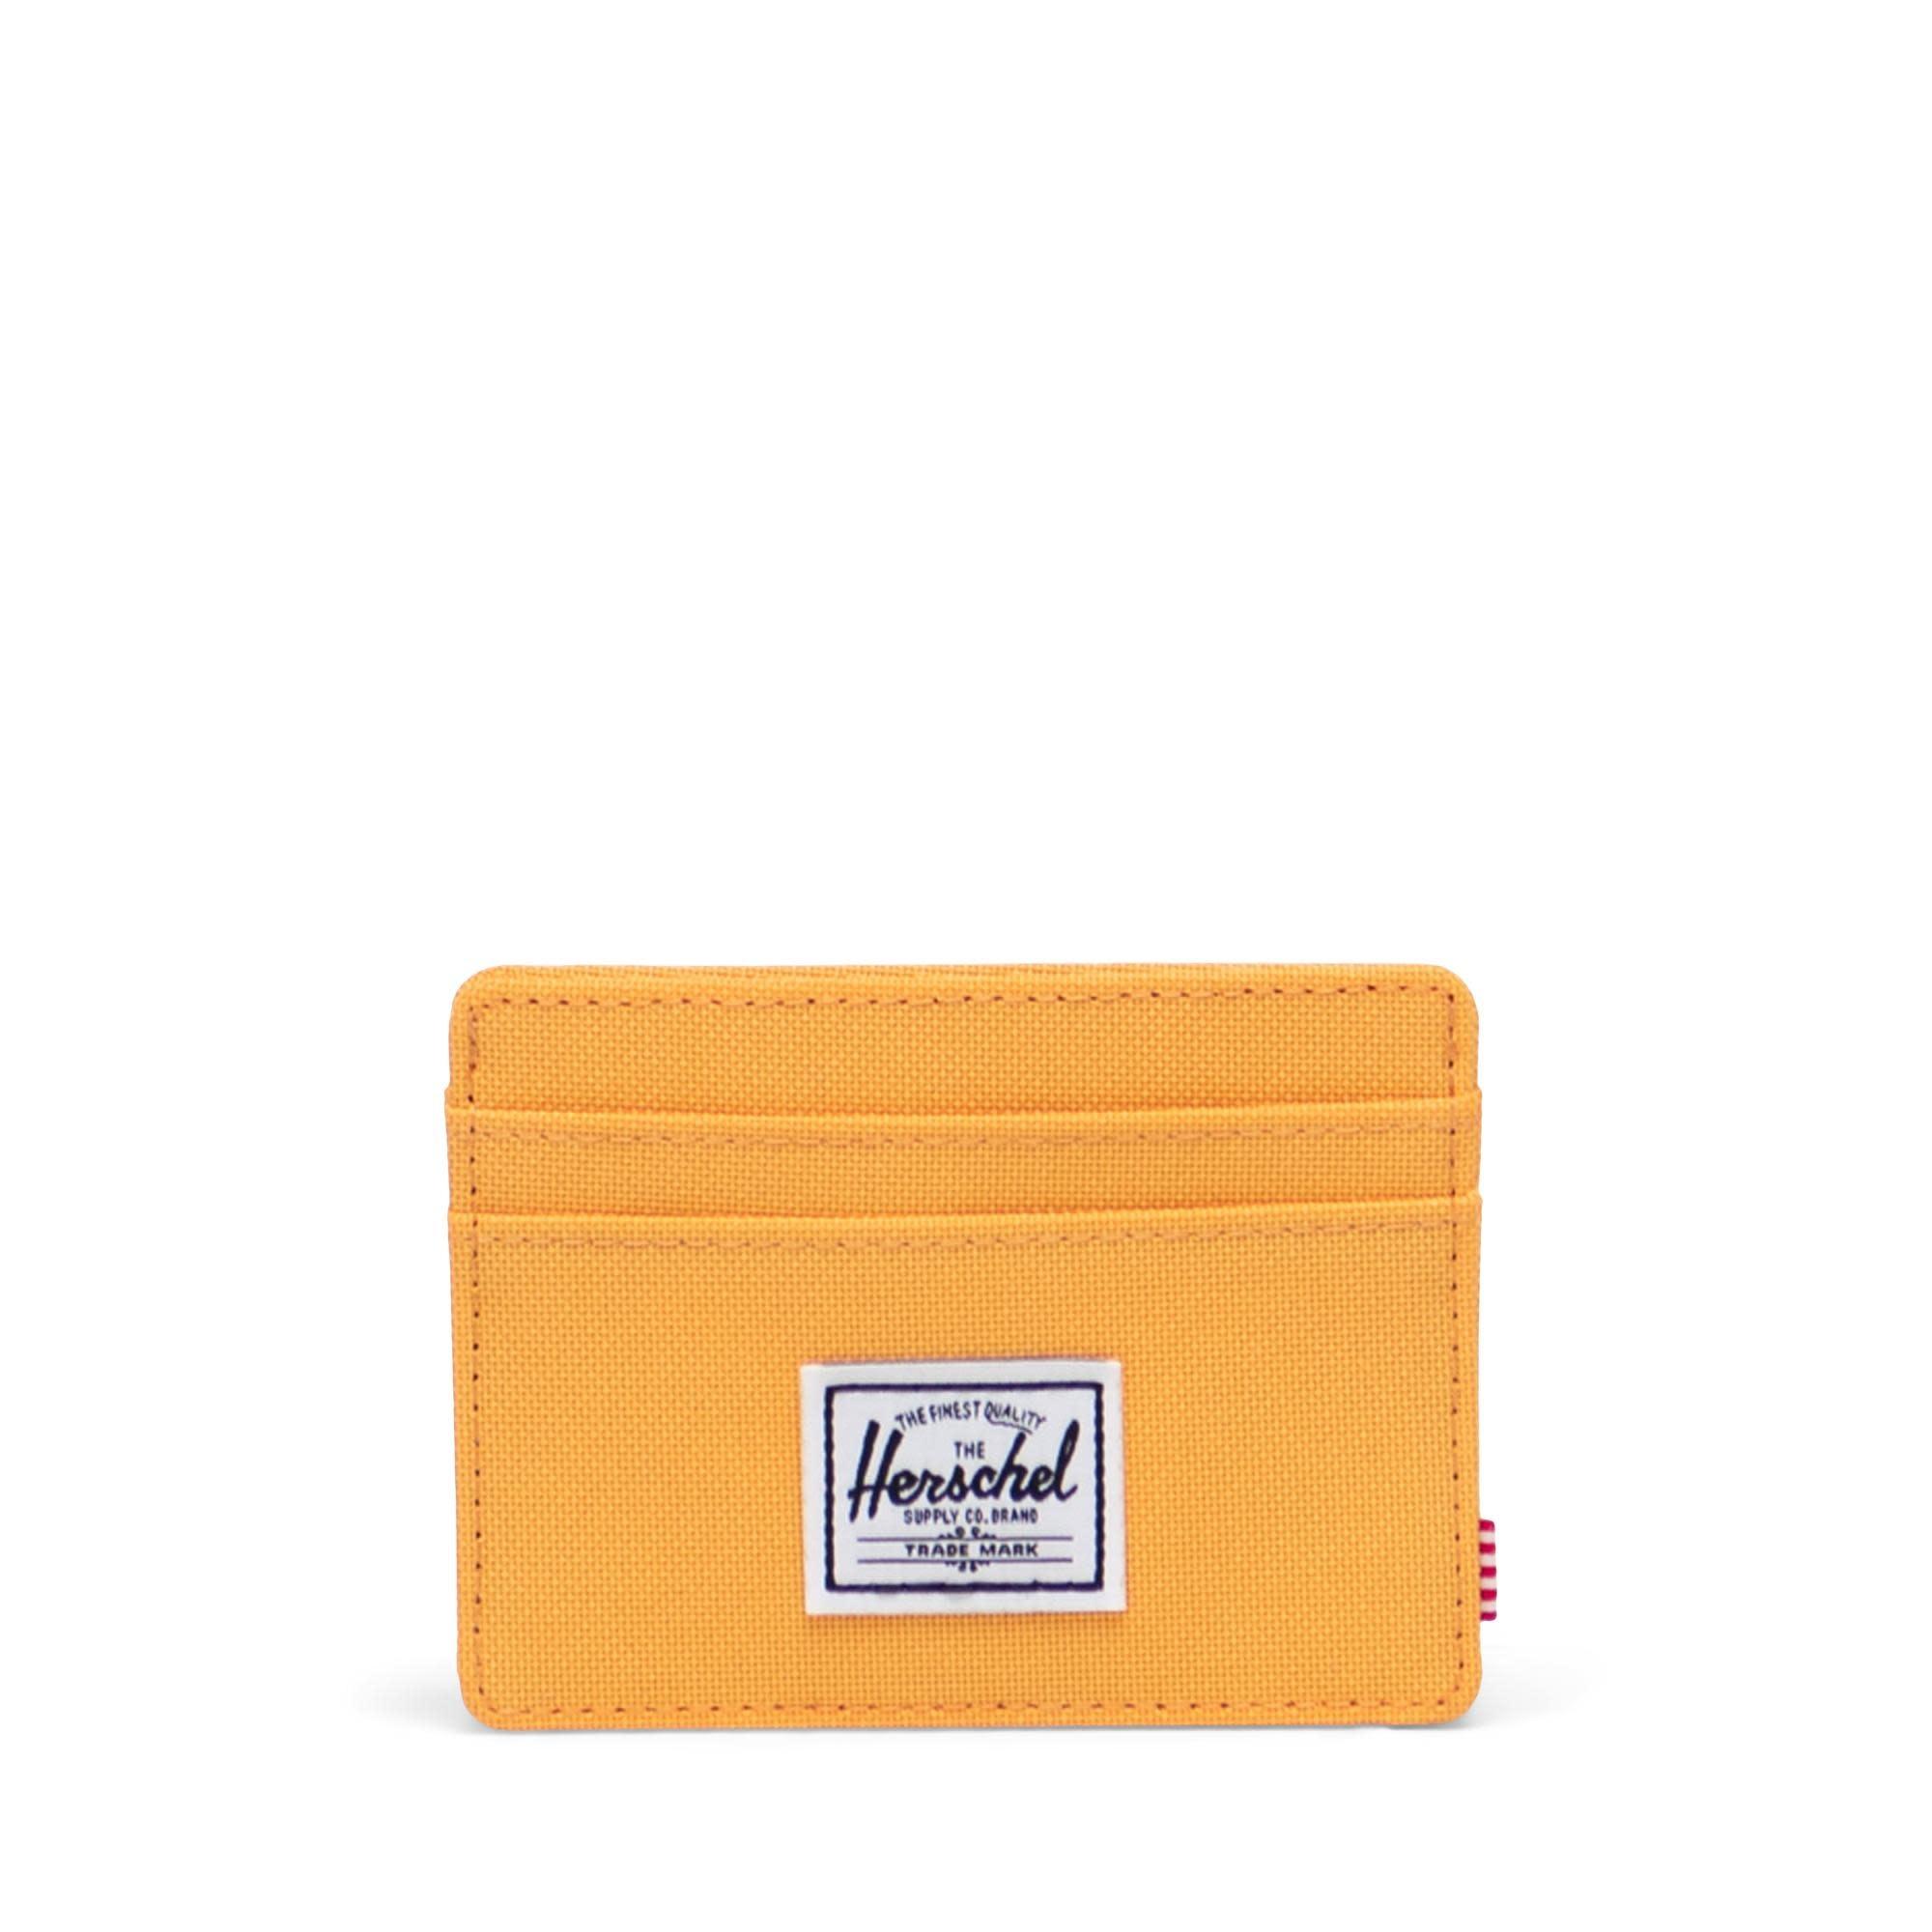 Herschel Supply Co. Herschel Charlie Wallet - Blazing Orange